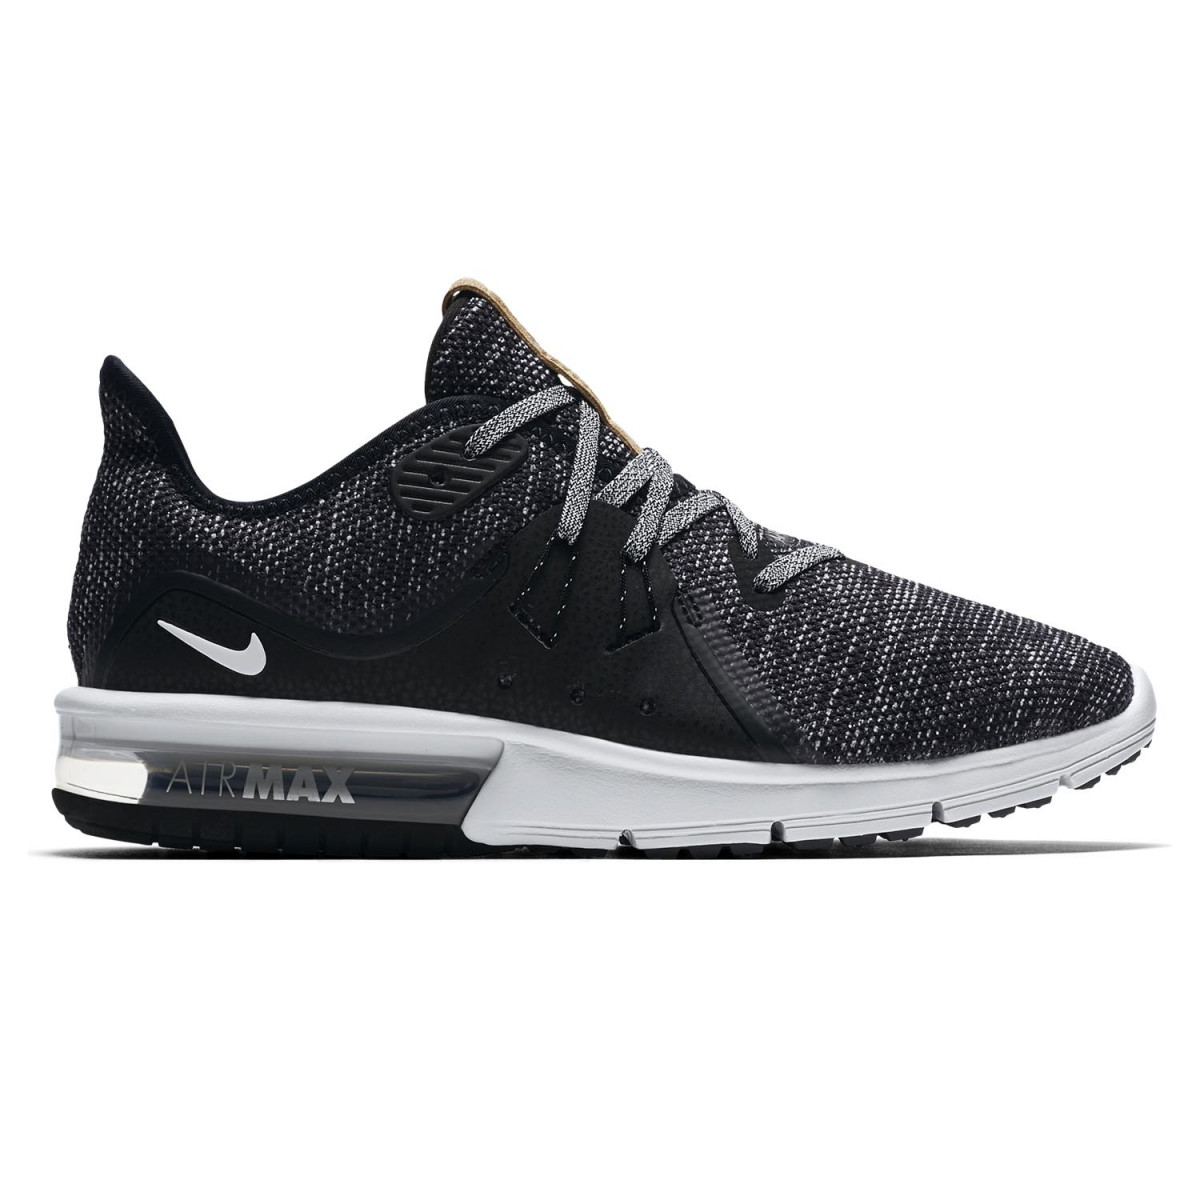 Zapatillas Nike Air Max Sequent 3